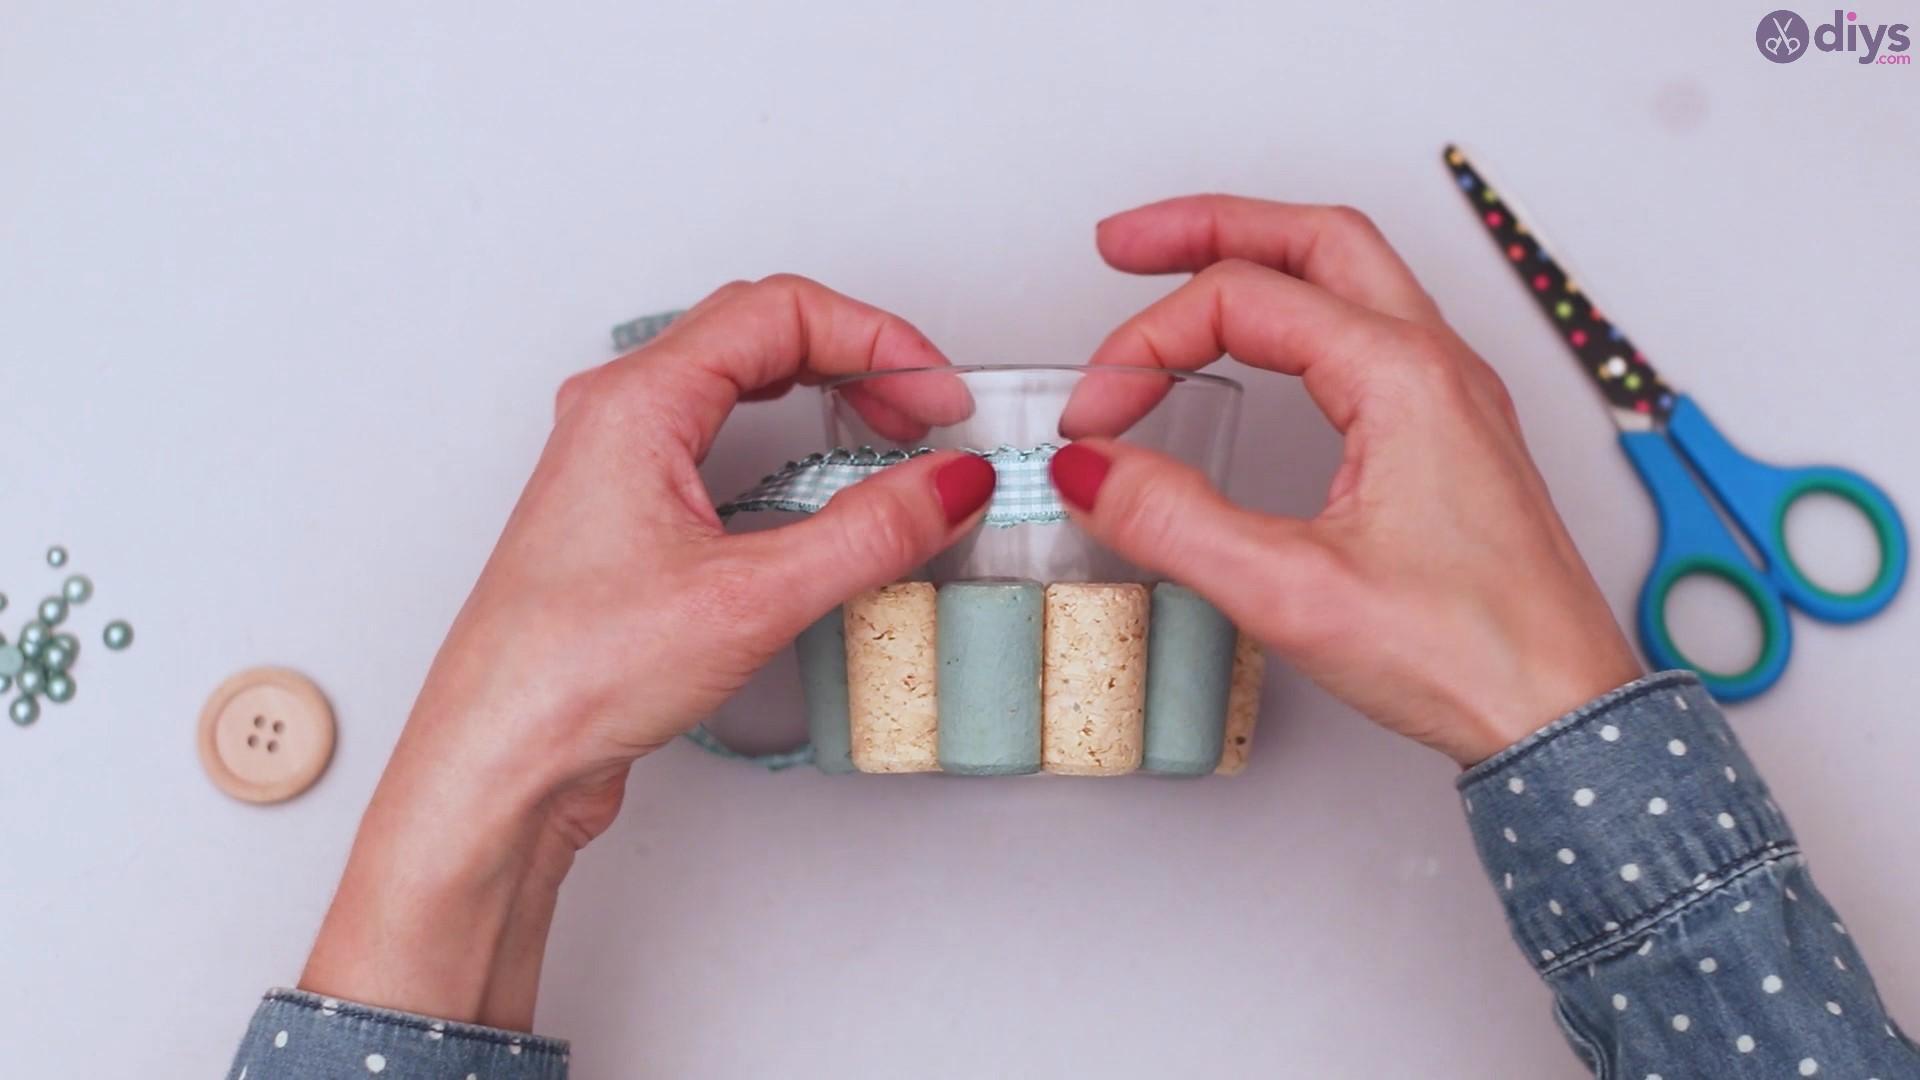 Diy wine cork candle holder (18)